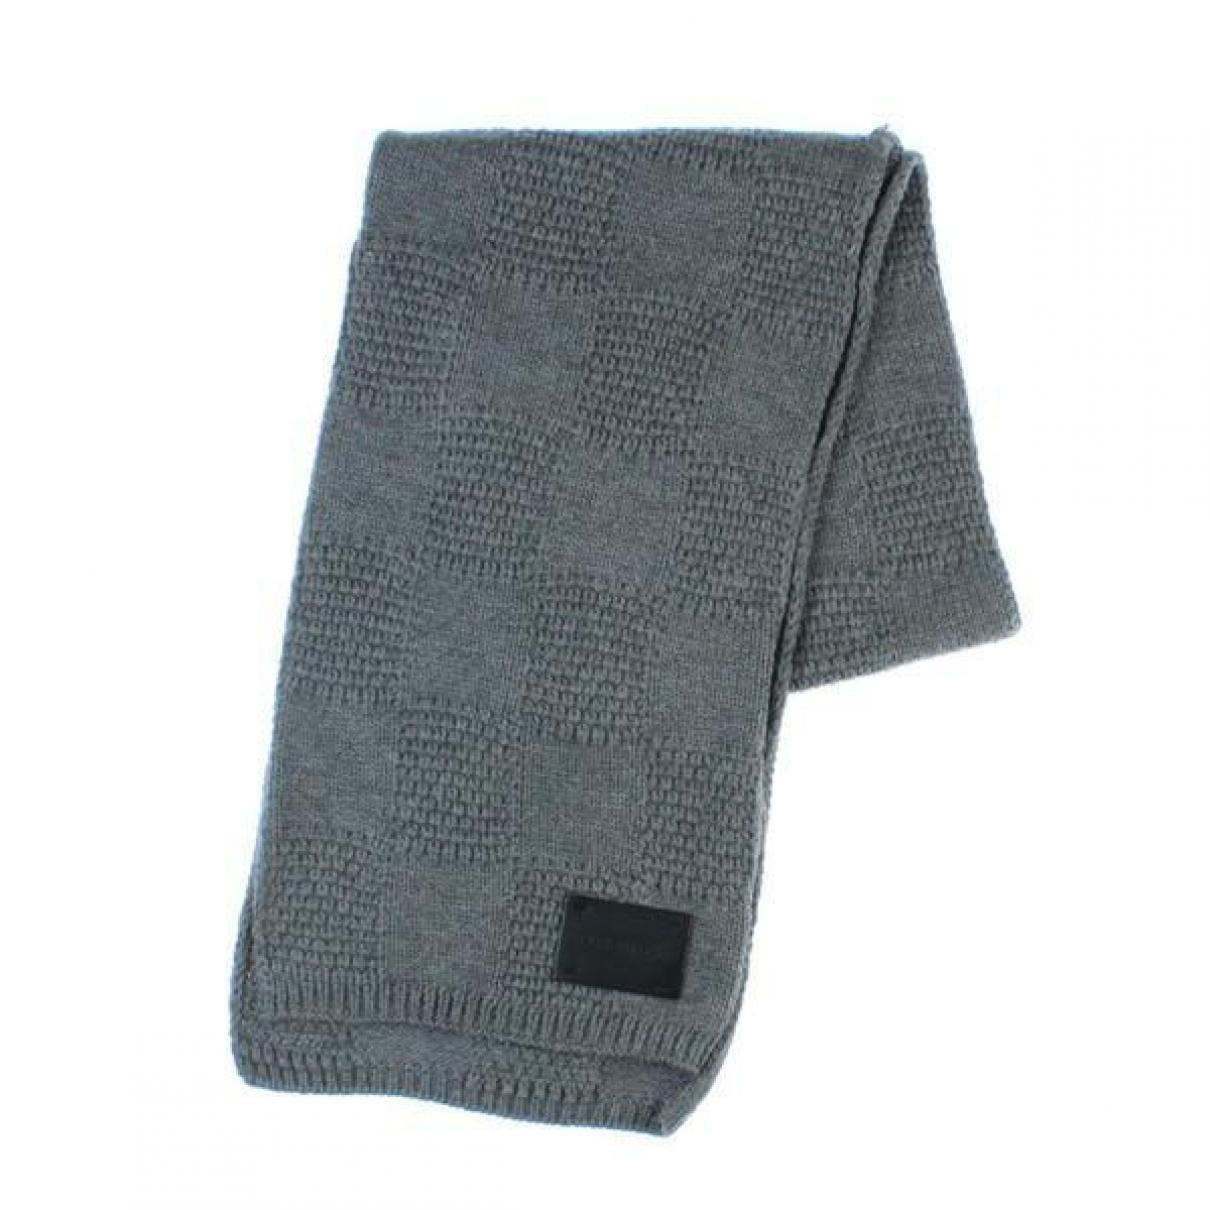 Louis Vuitton \N Schal in  Grau Wolle